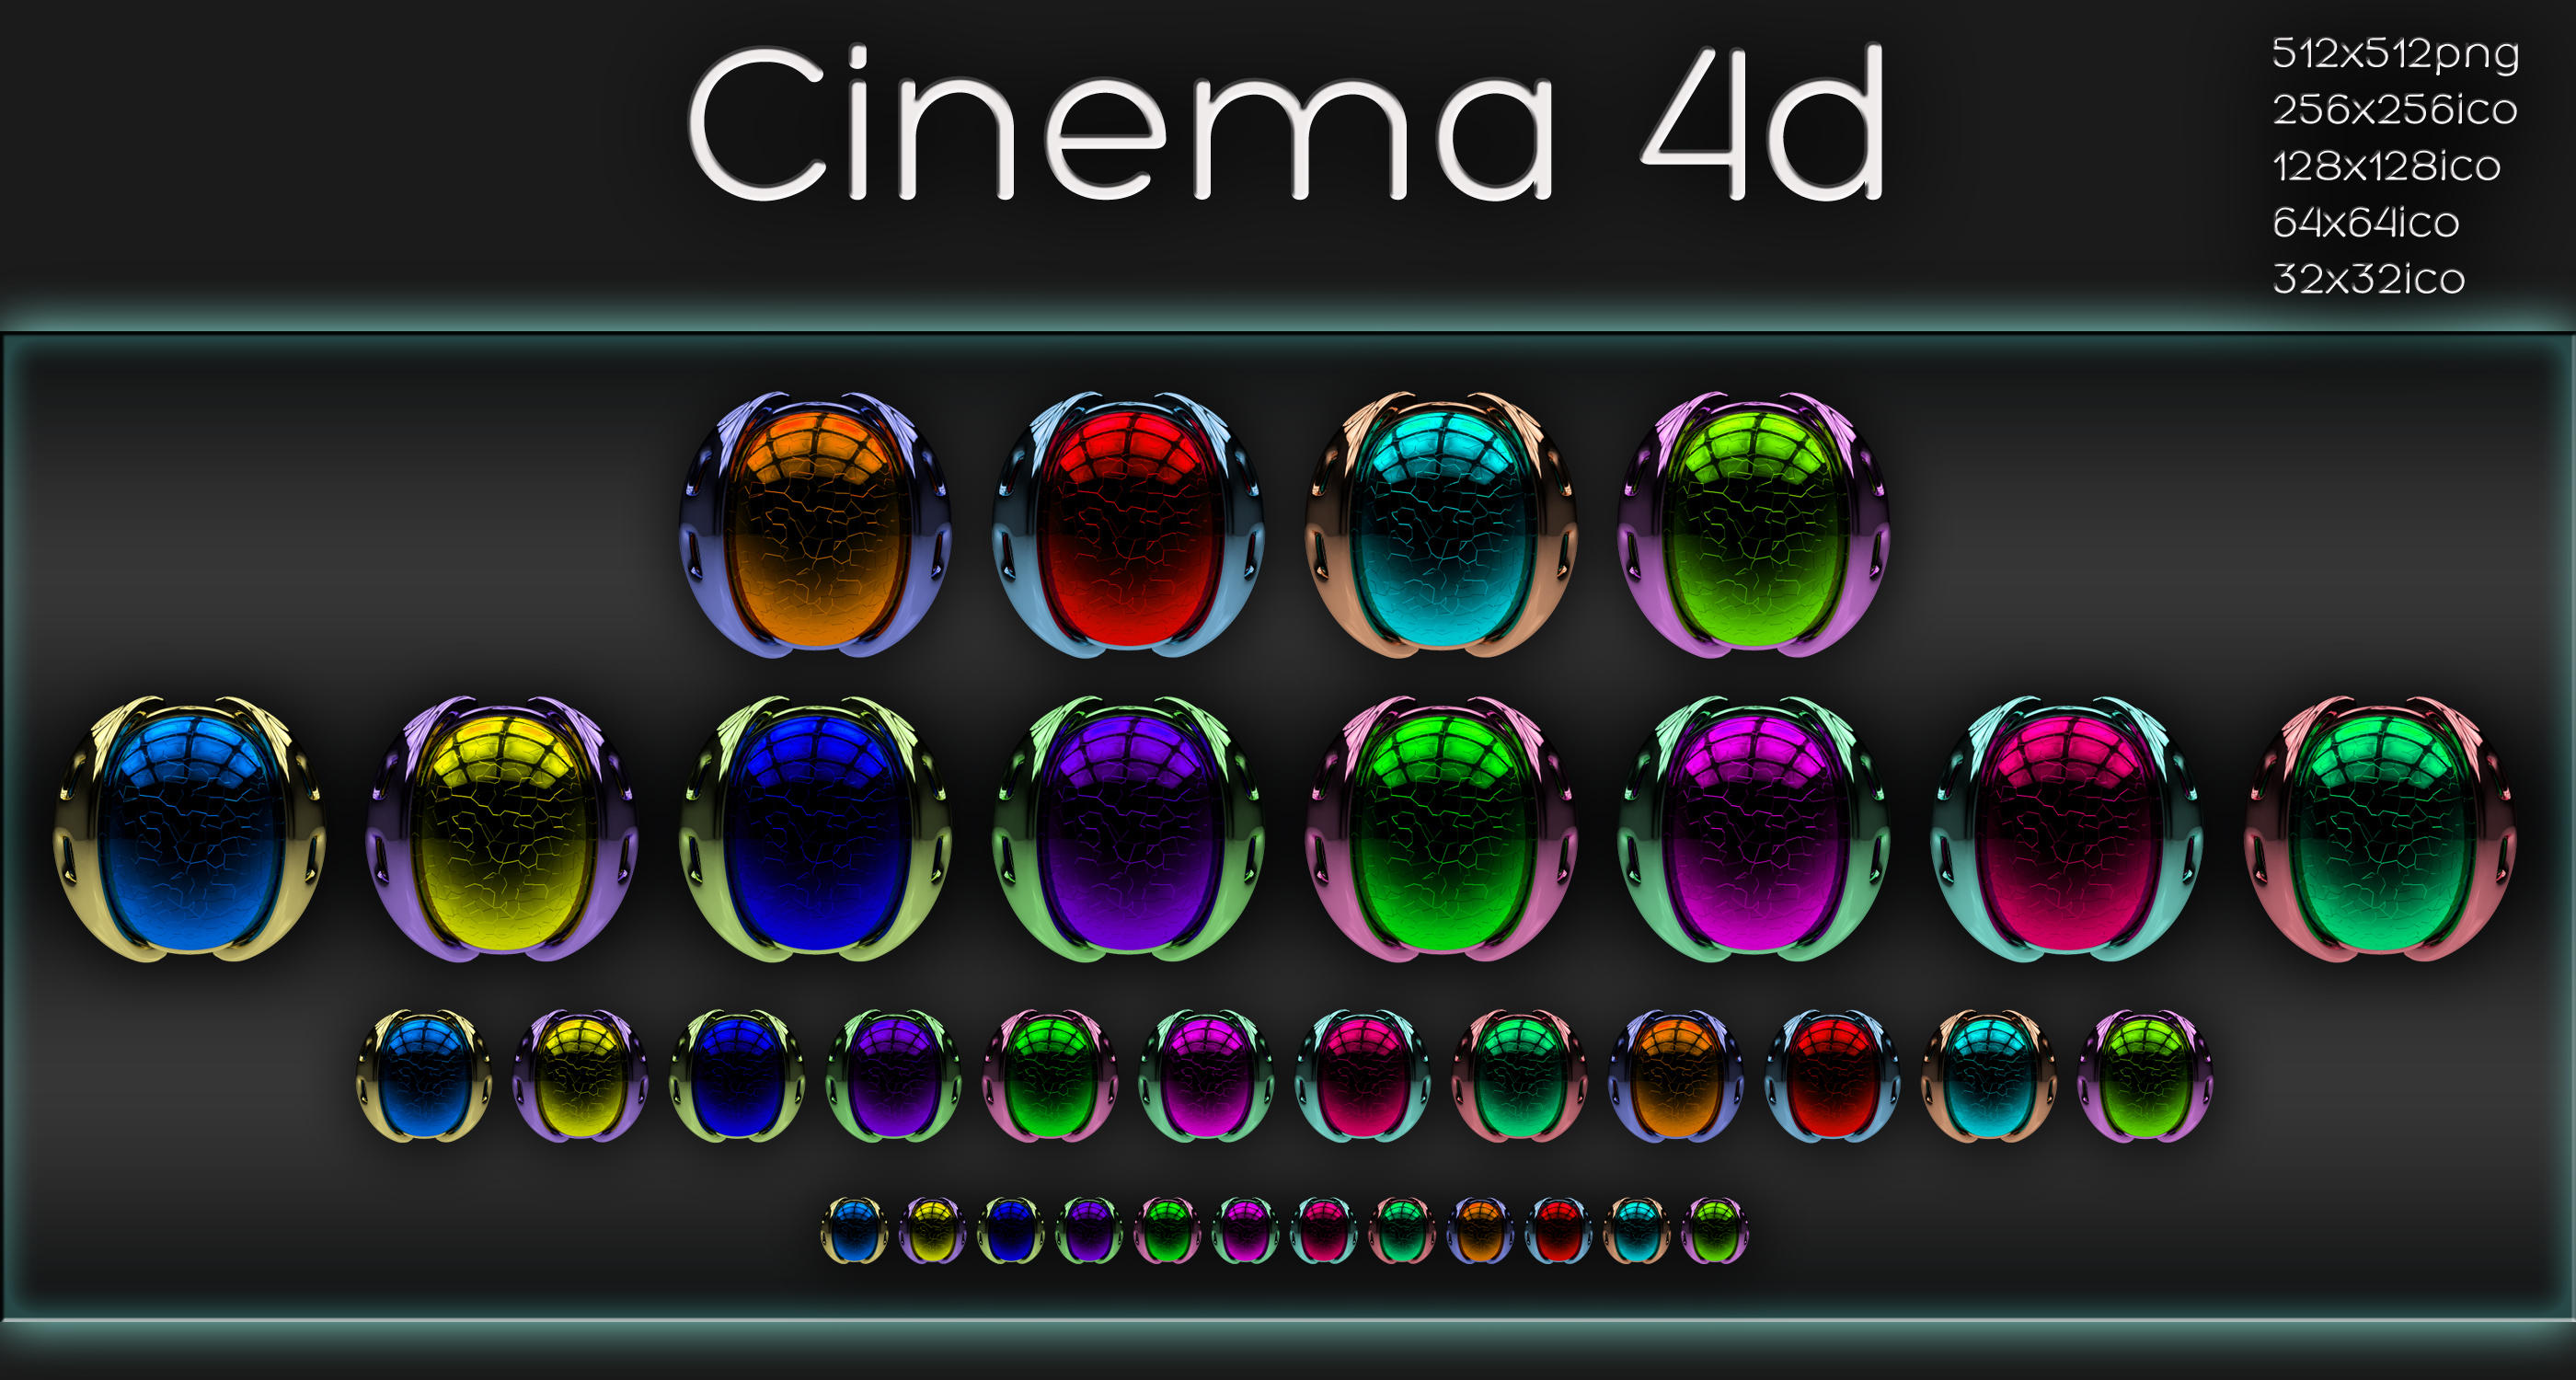 Cinema 4d icons by xylomon